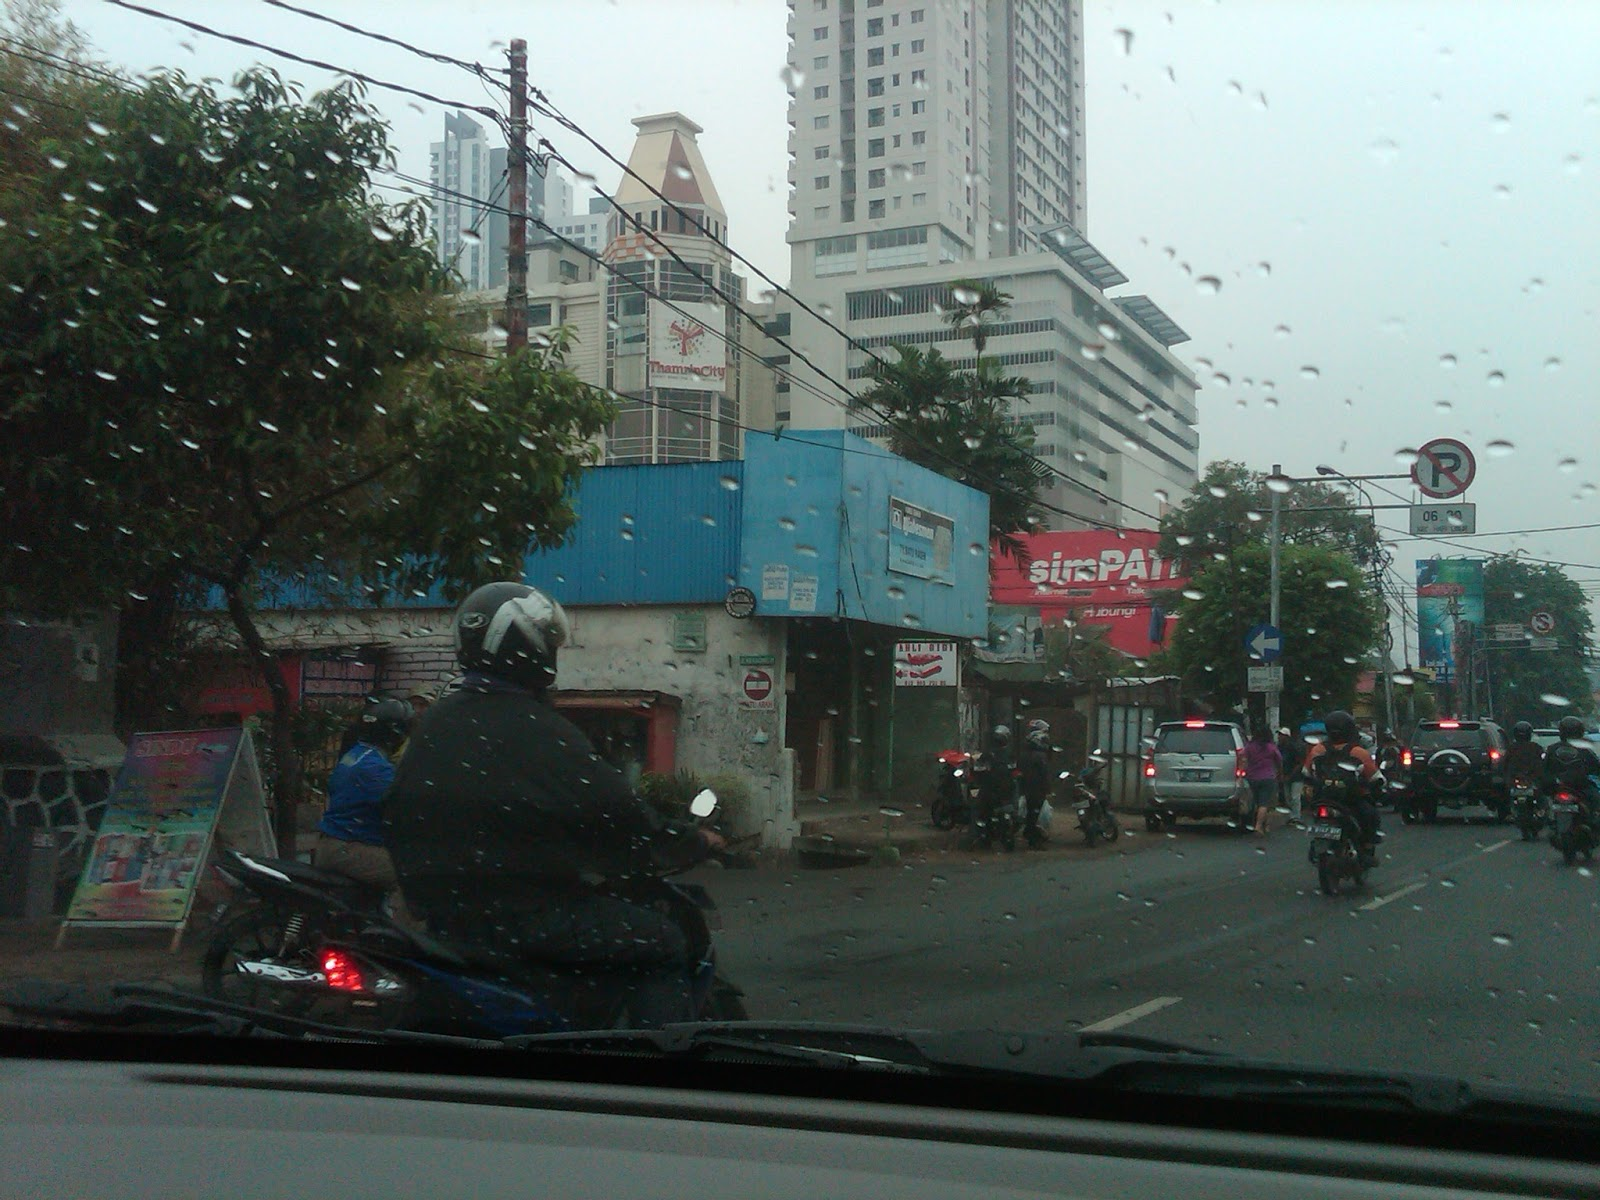 pusat batik nusantara menghadirkan batik dari seluruh indonesia ...